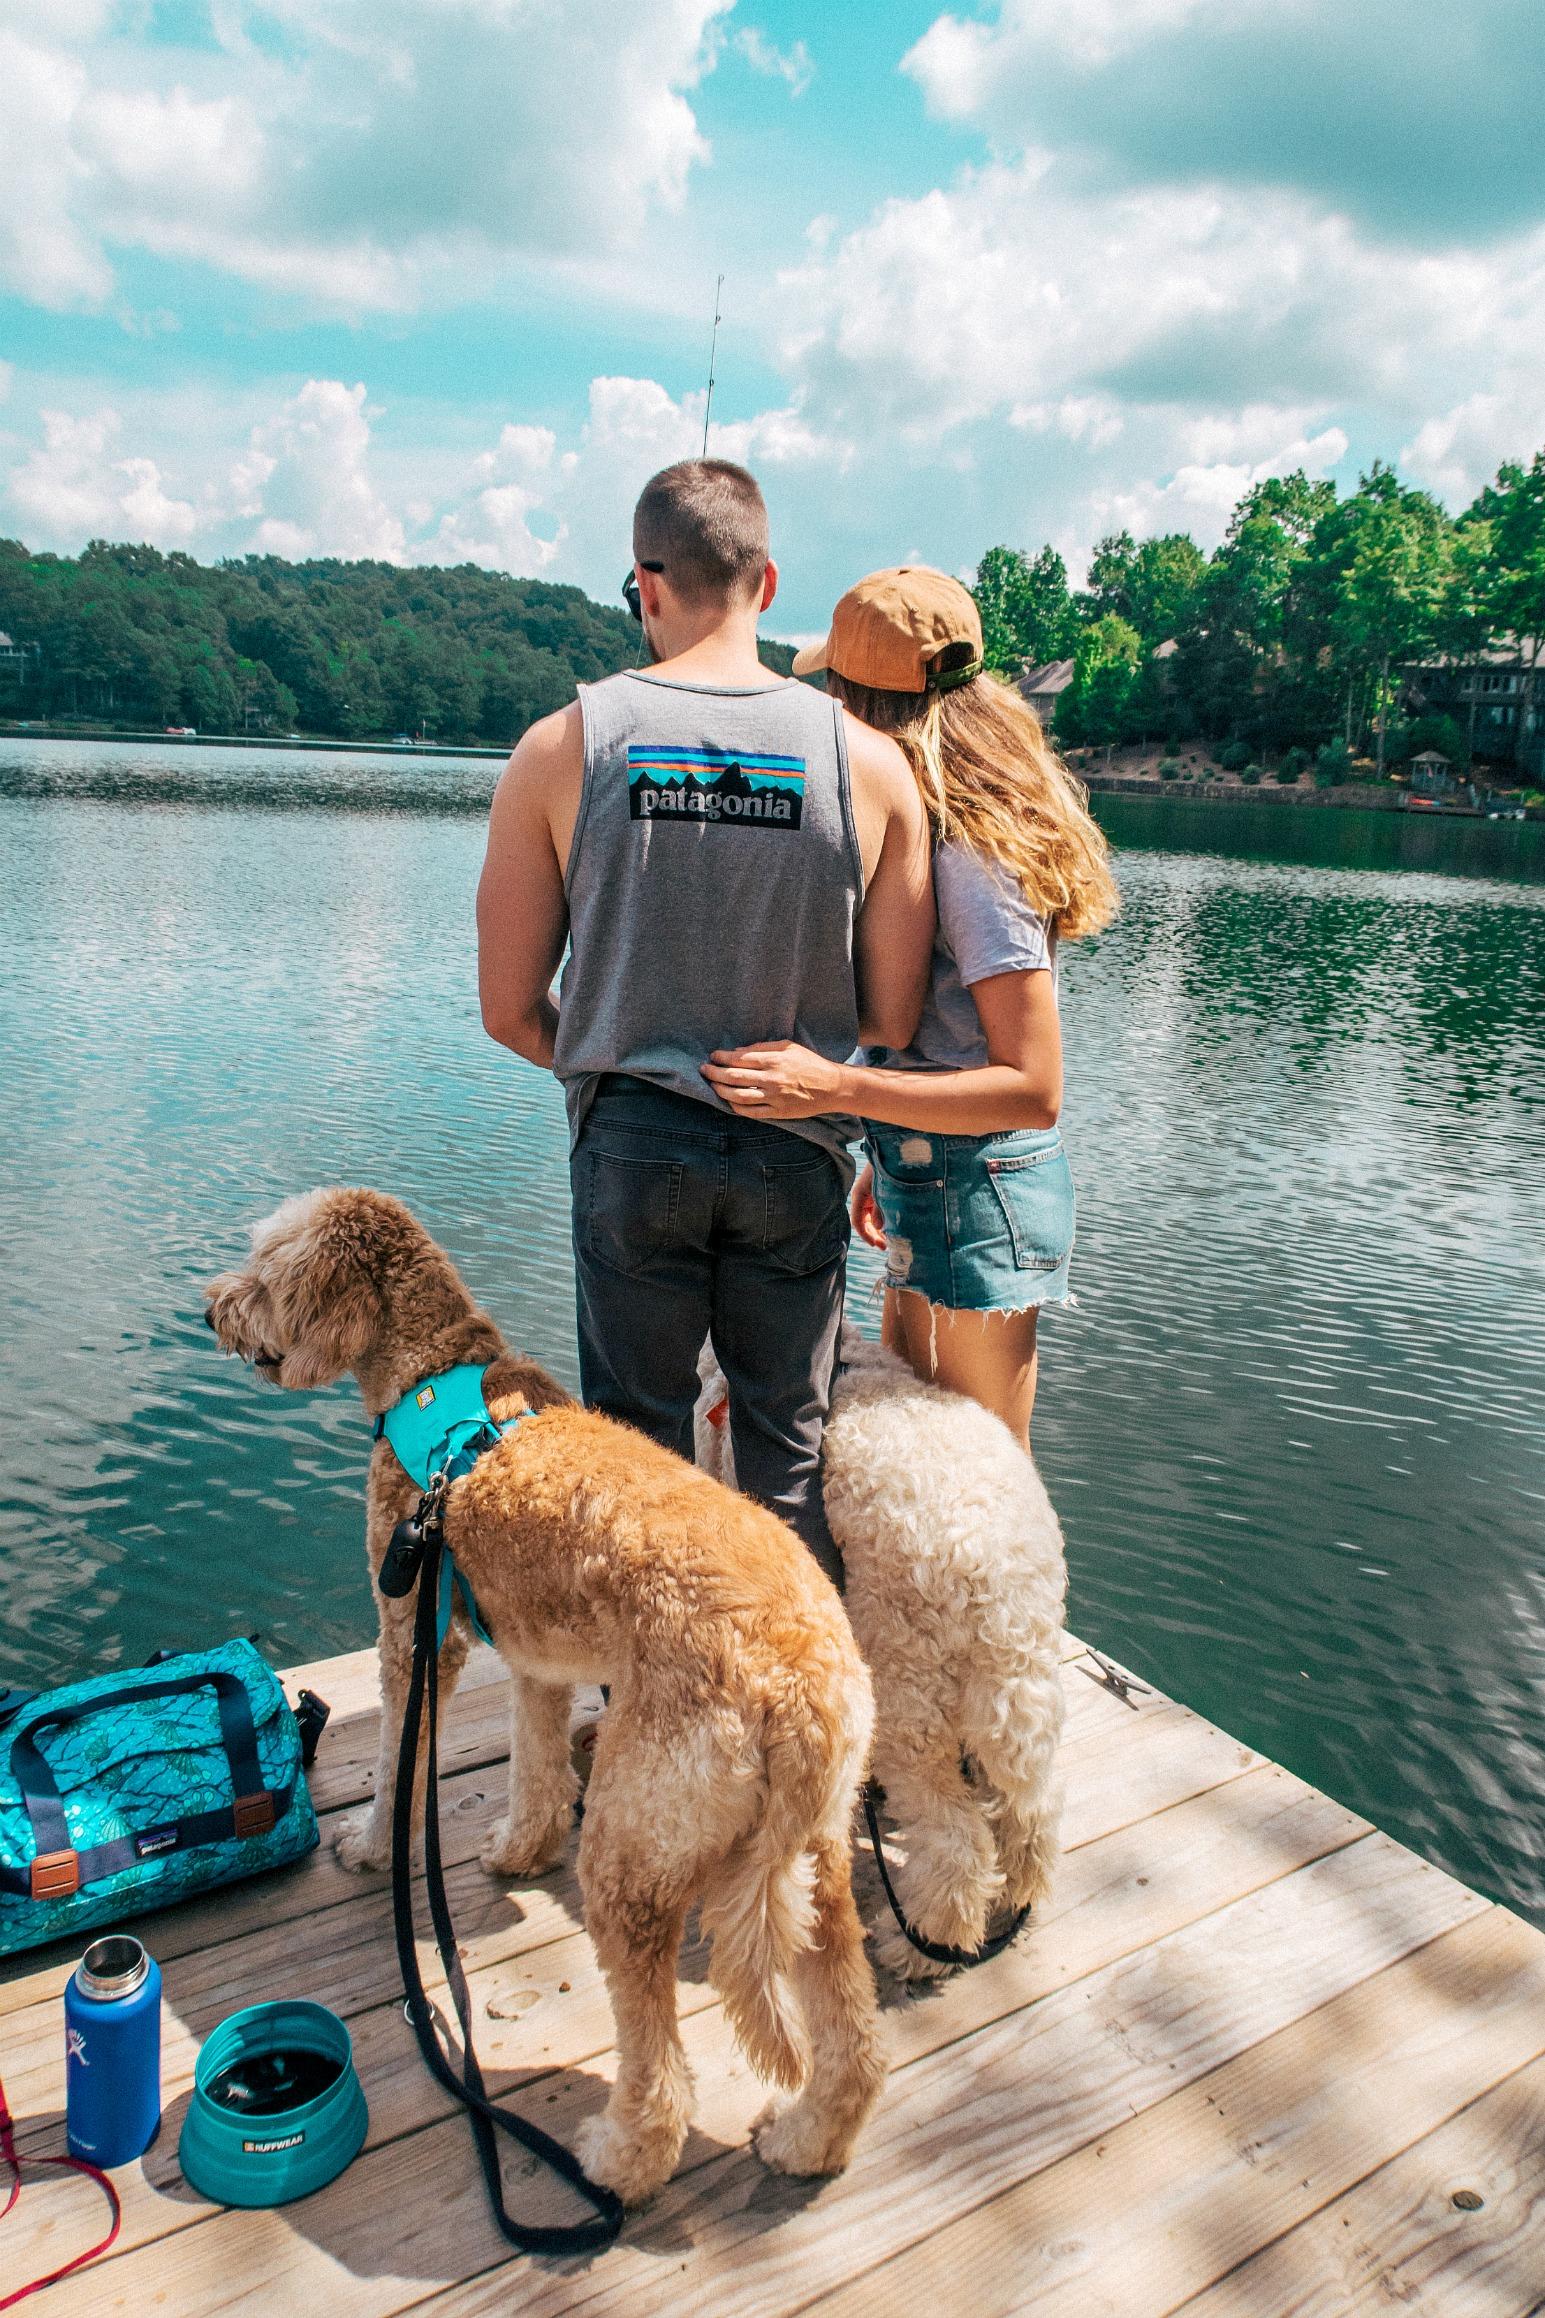 couples hiking, dogs, ruffwear, lake, mountain trip, hike, camp